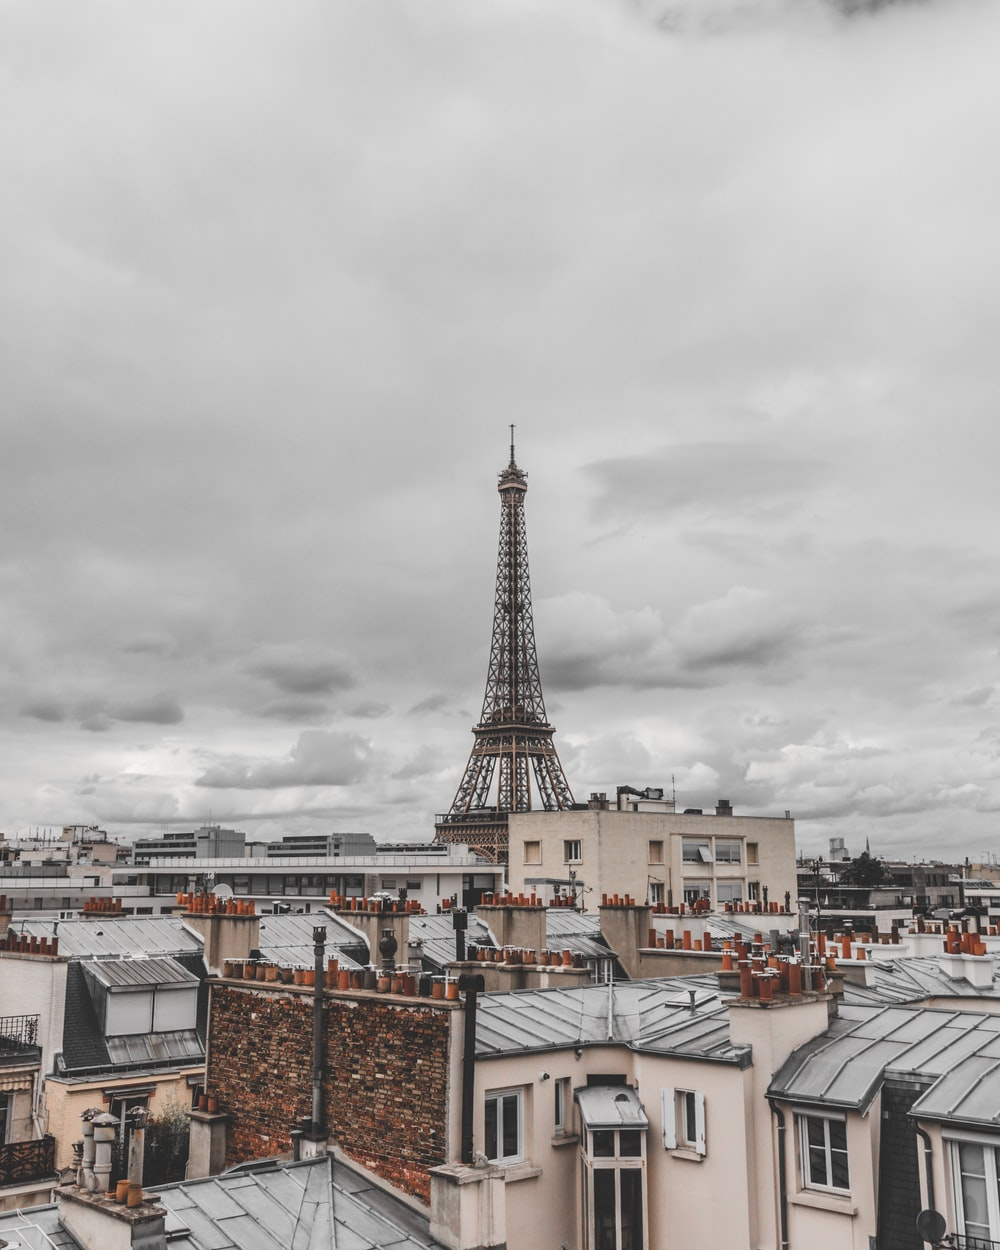 Eiffel tower under gray clouds